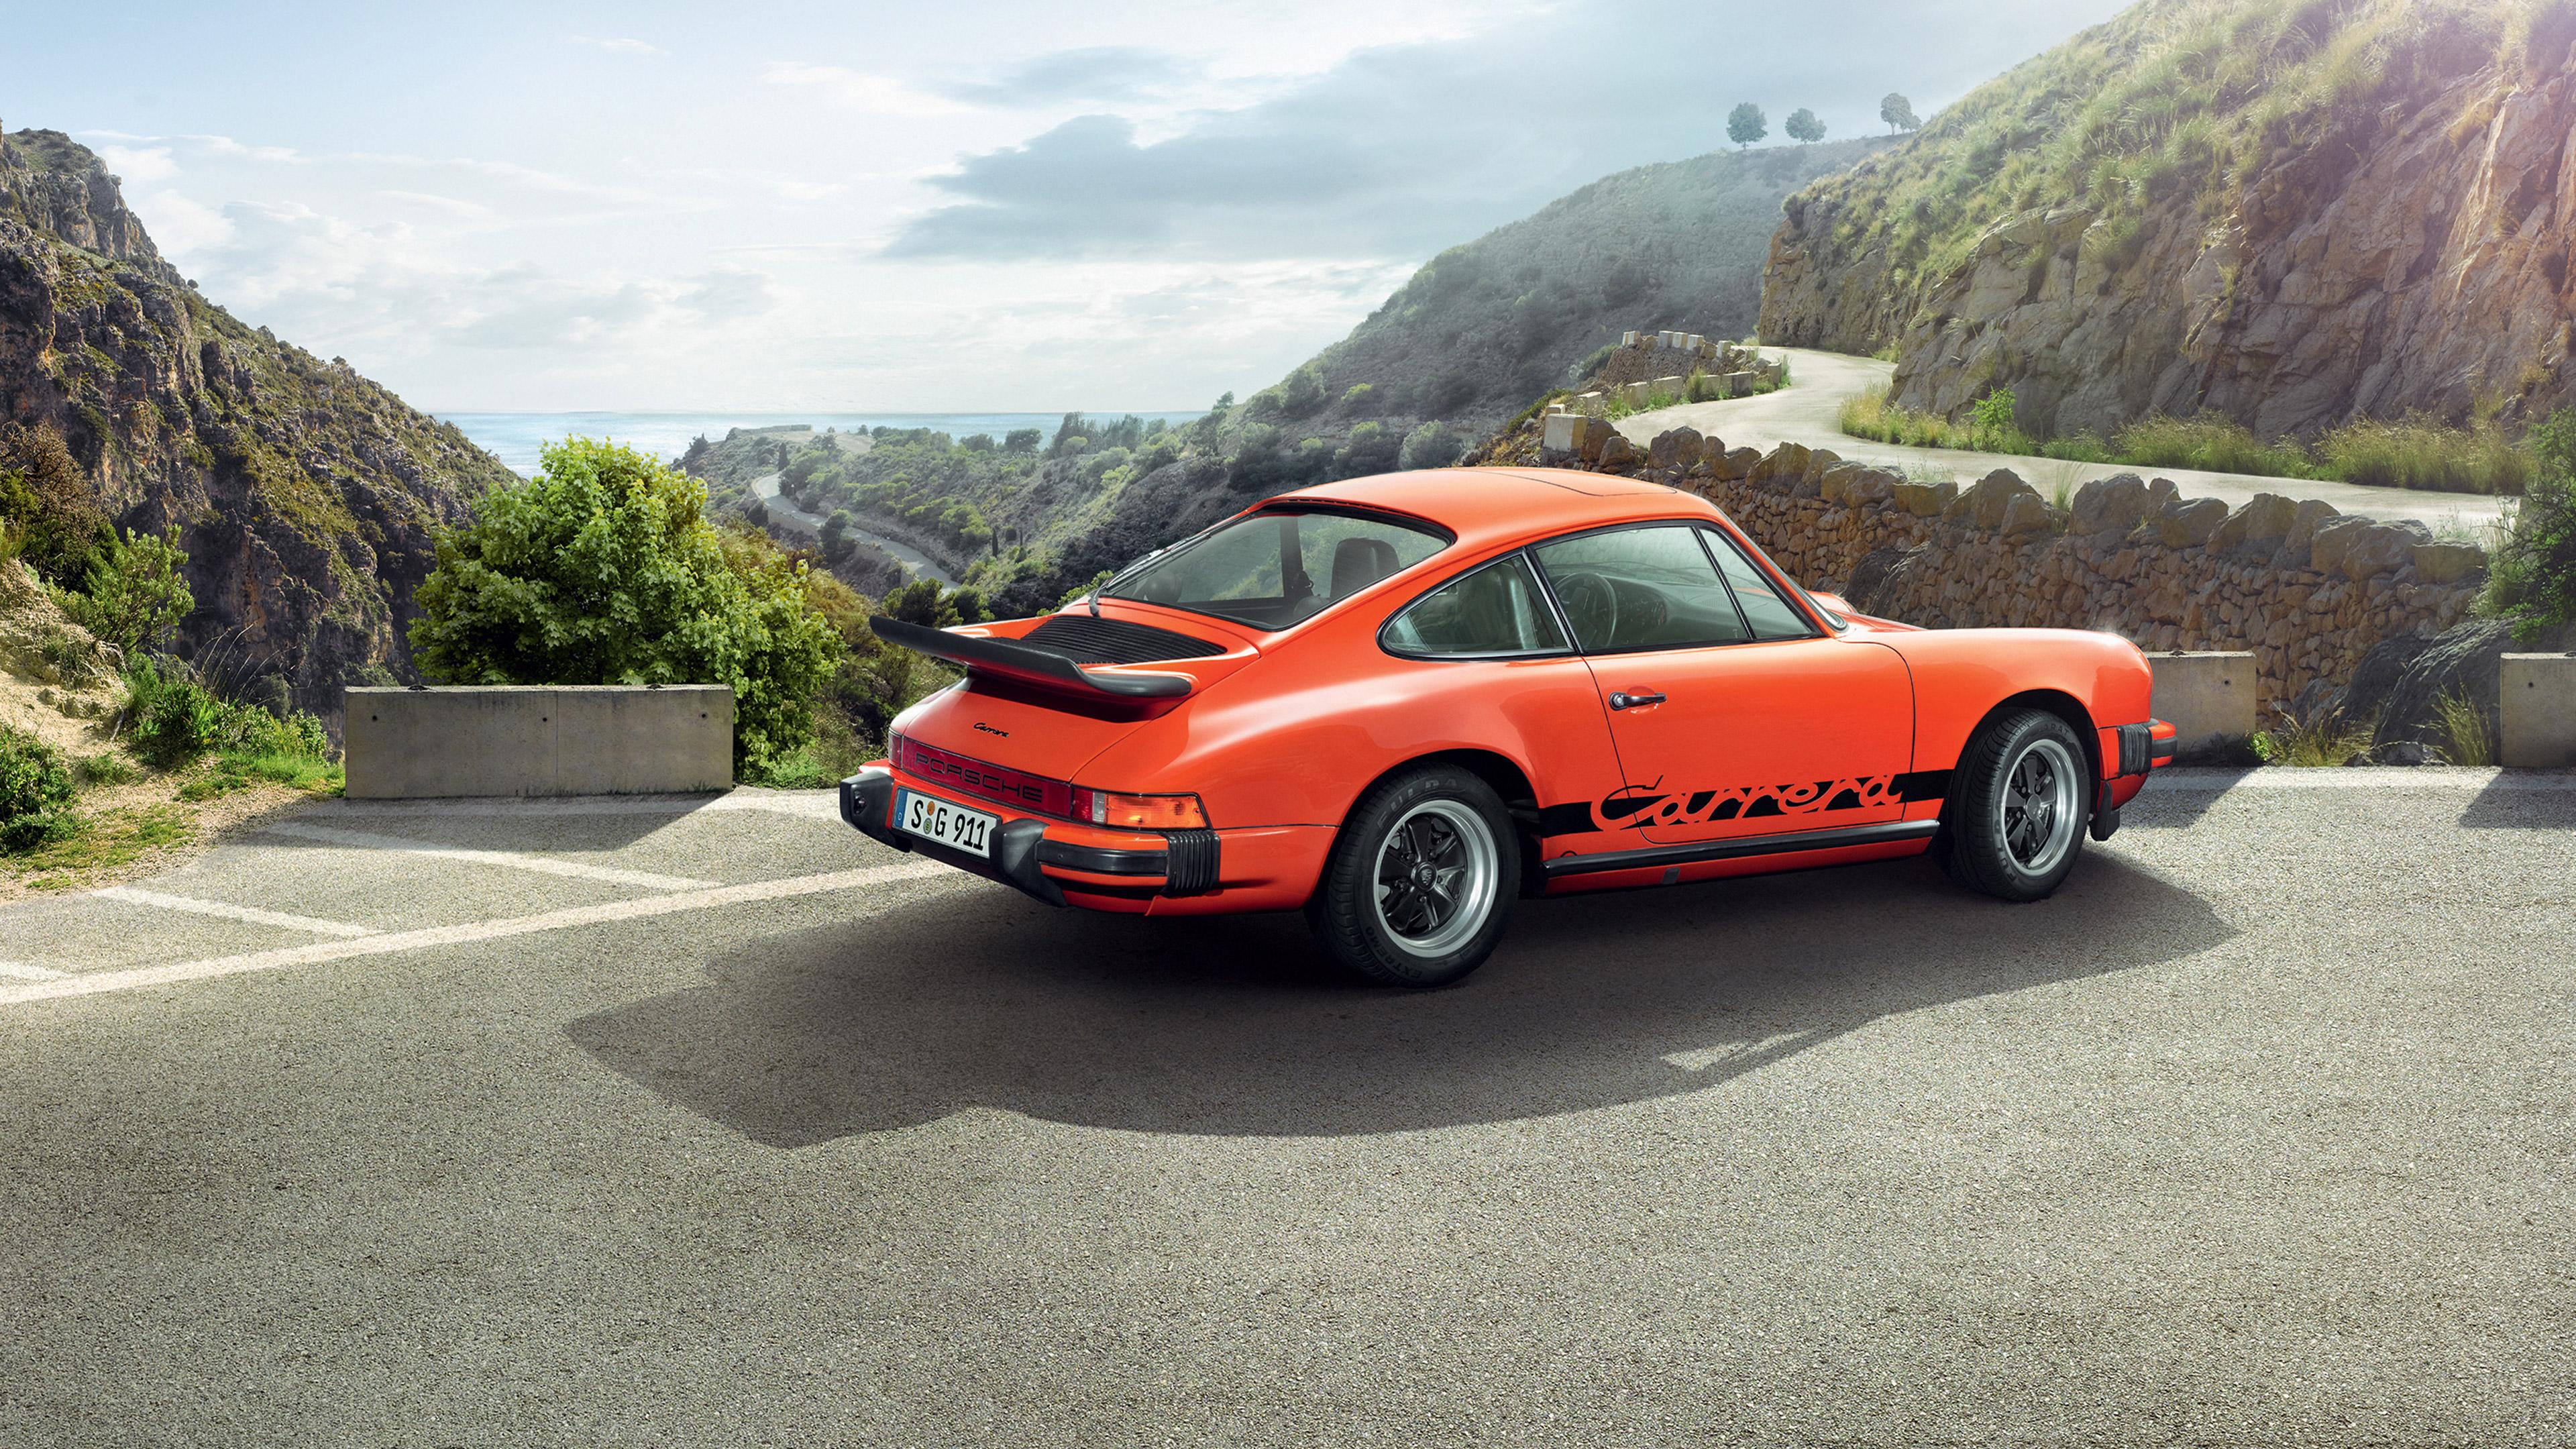 porsche 911 carrera hd 1539104659 - Porsche 911 Carrera HD - porsche wallpapers, porsche 911 wallpapers, cars wallpapers